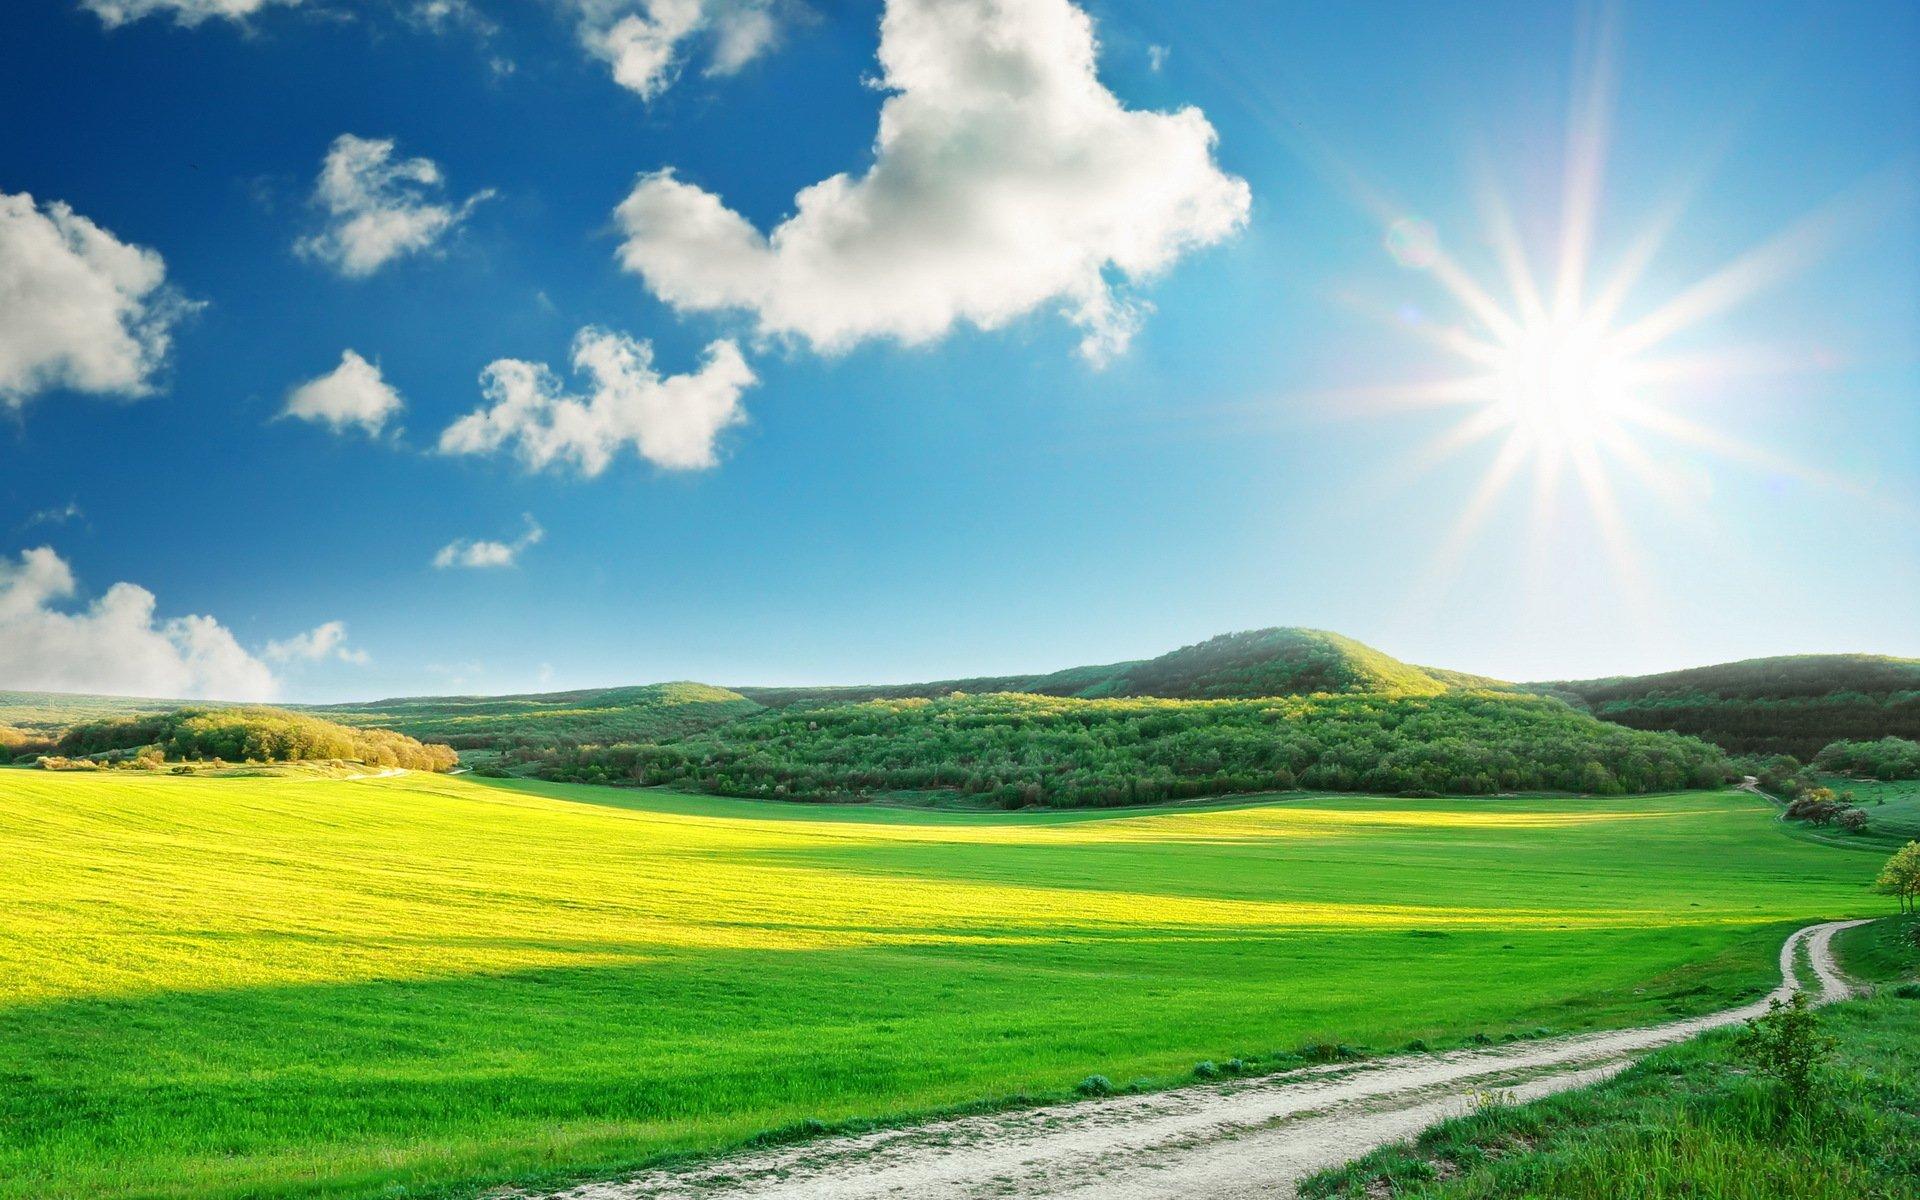 Beautiful Sunny Day Wallpaper - WallpaperSafari  |Sunny Beautiful Day